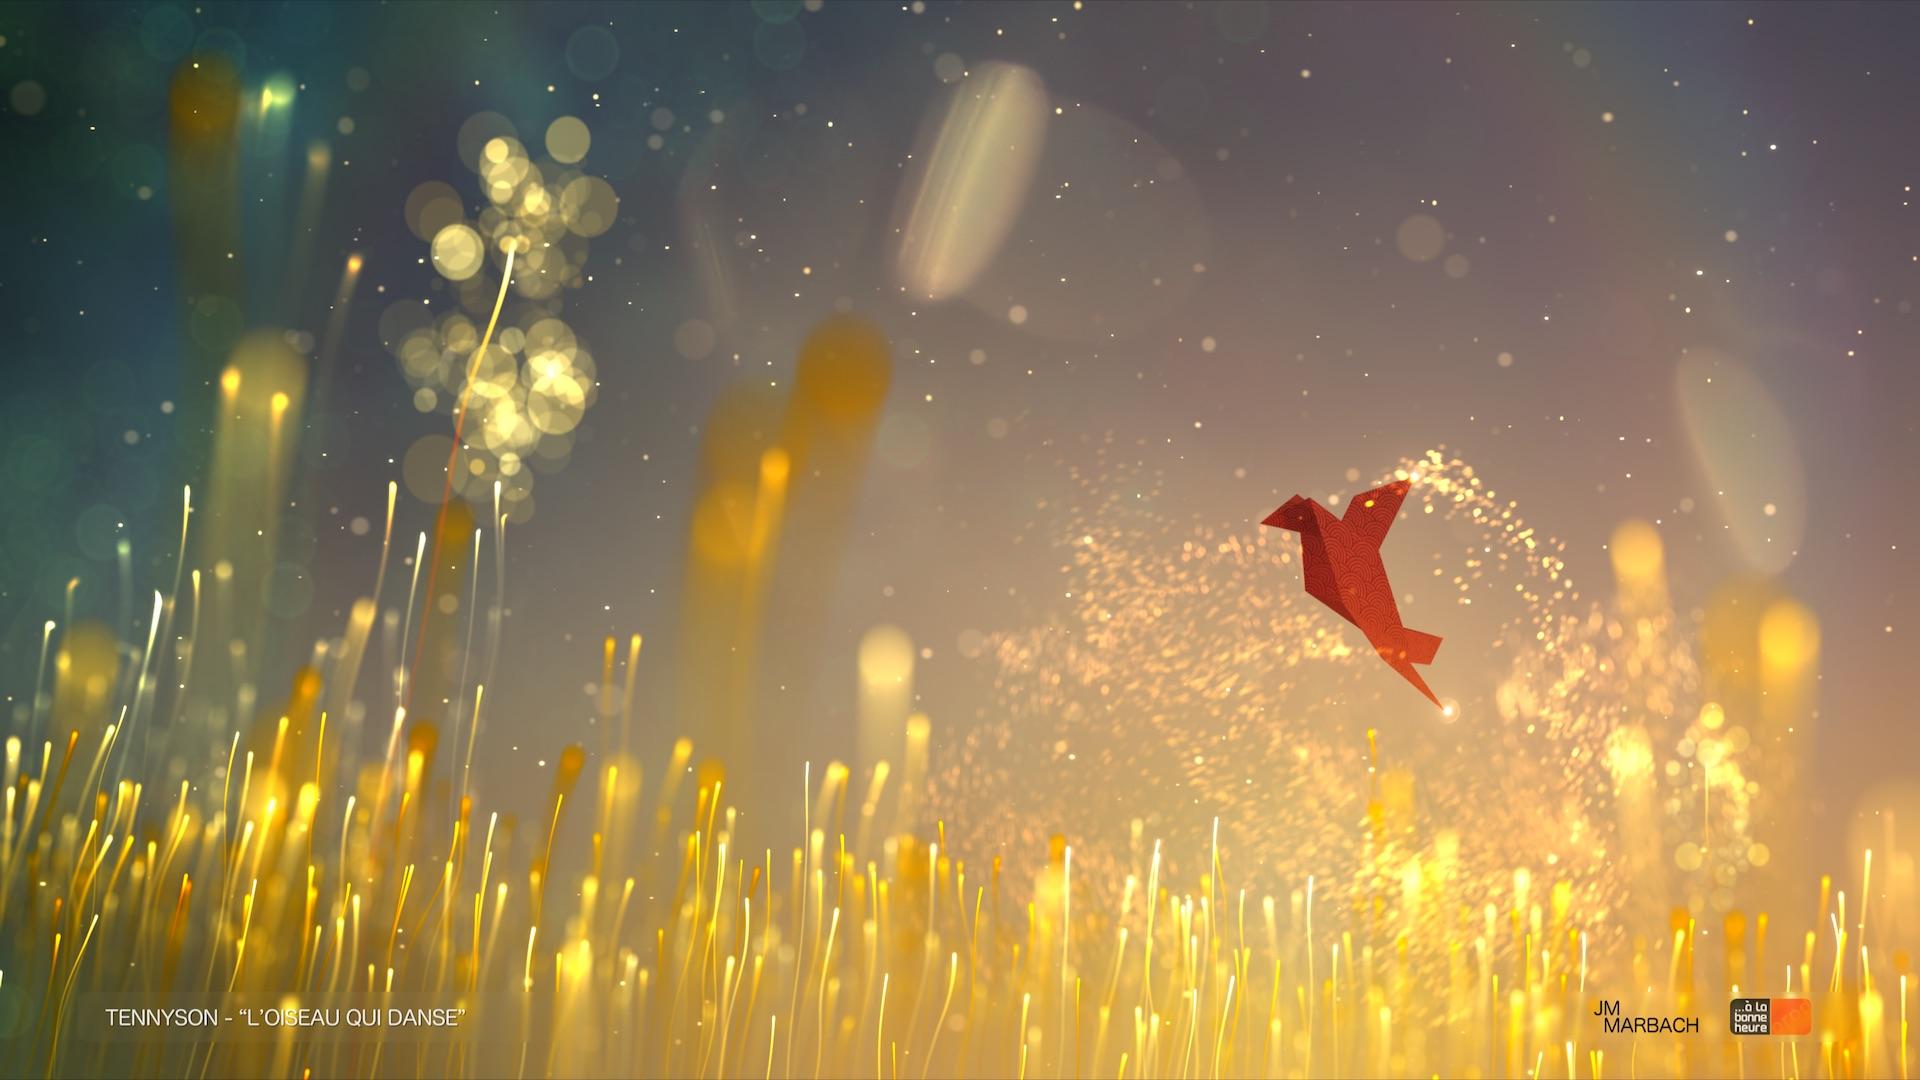 Tennyson_L_oiseau_qui_danse_12.jpg